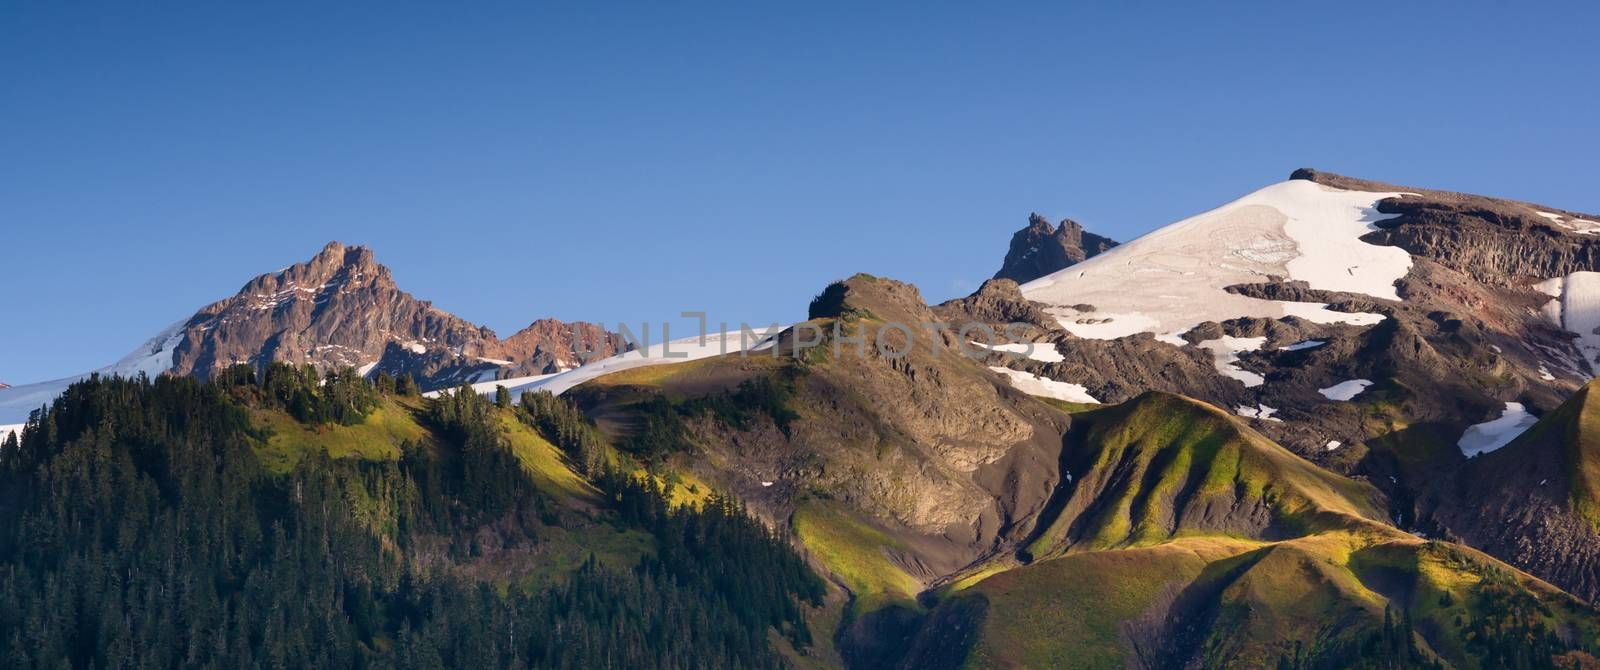 Heliotrope Ridge and natural beauty found around the Cascade Range